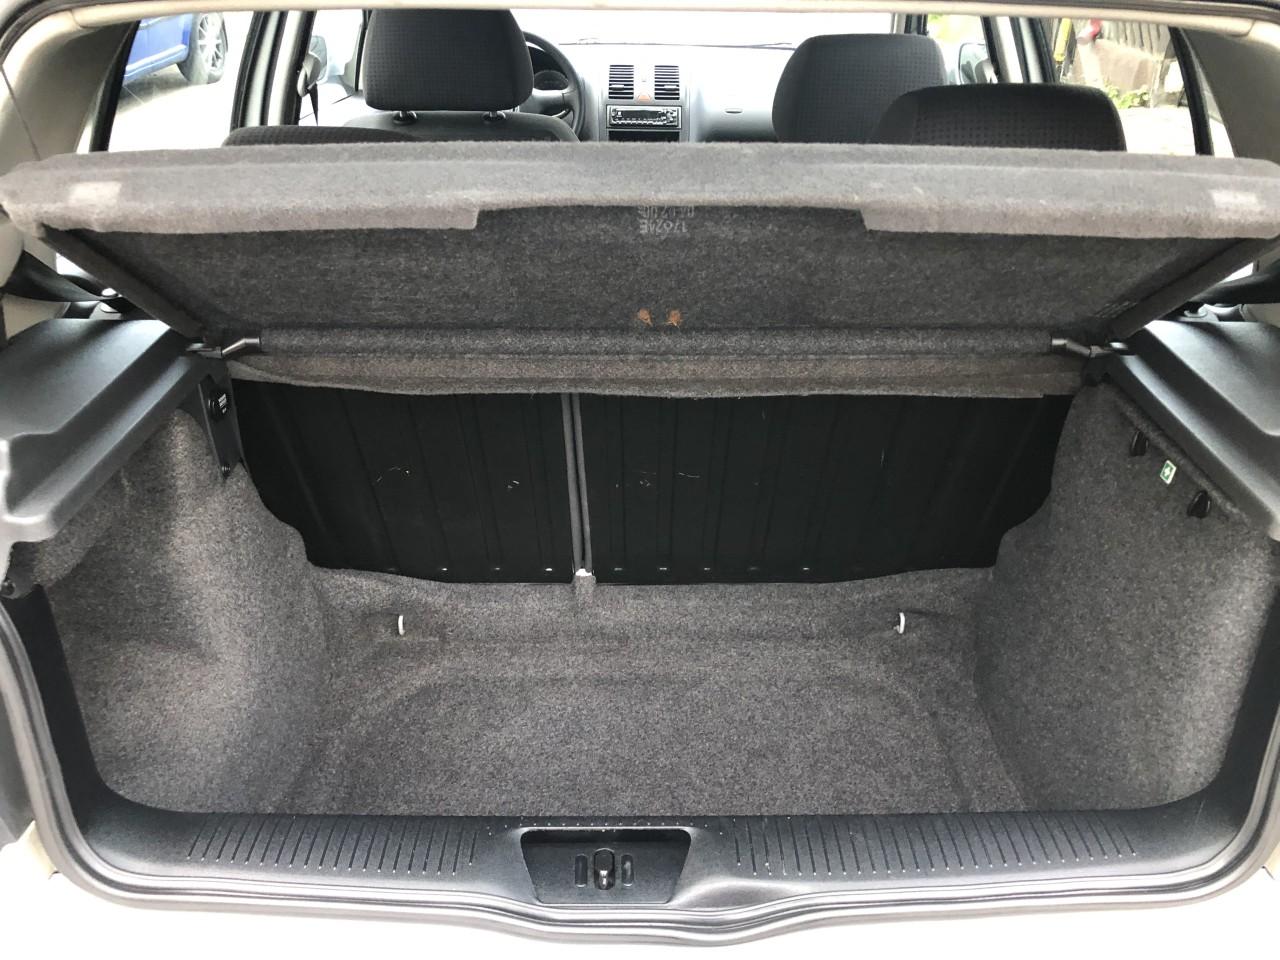 VW Polo 1400 TDI, consum f. scazut 2000